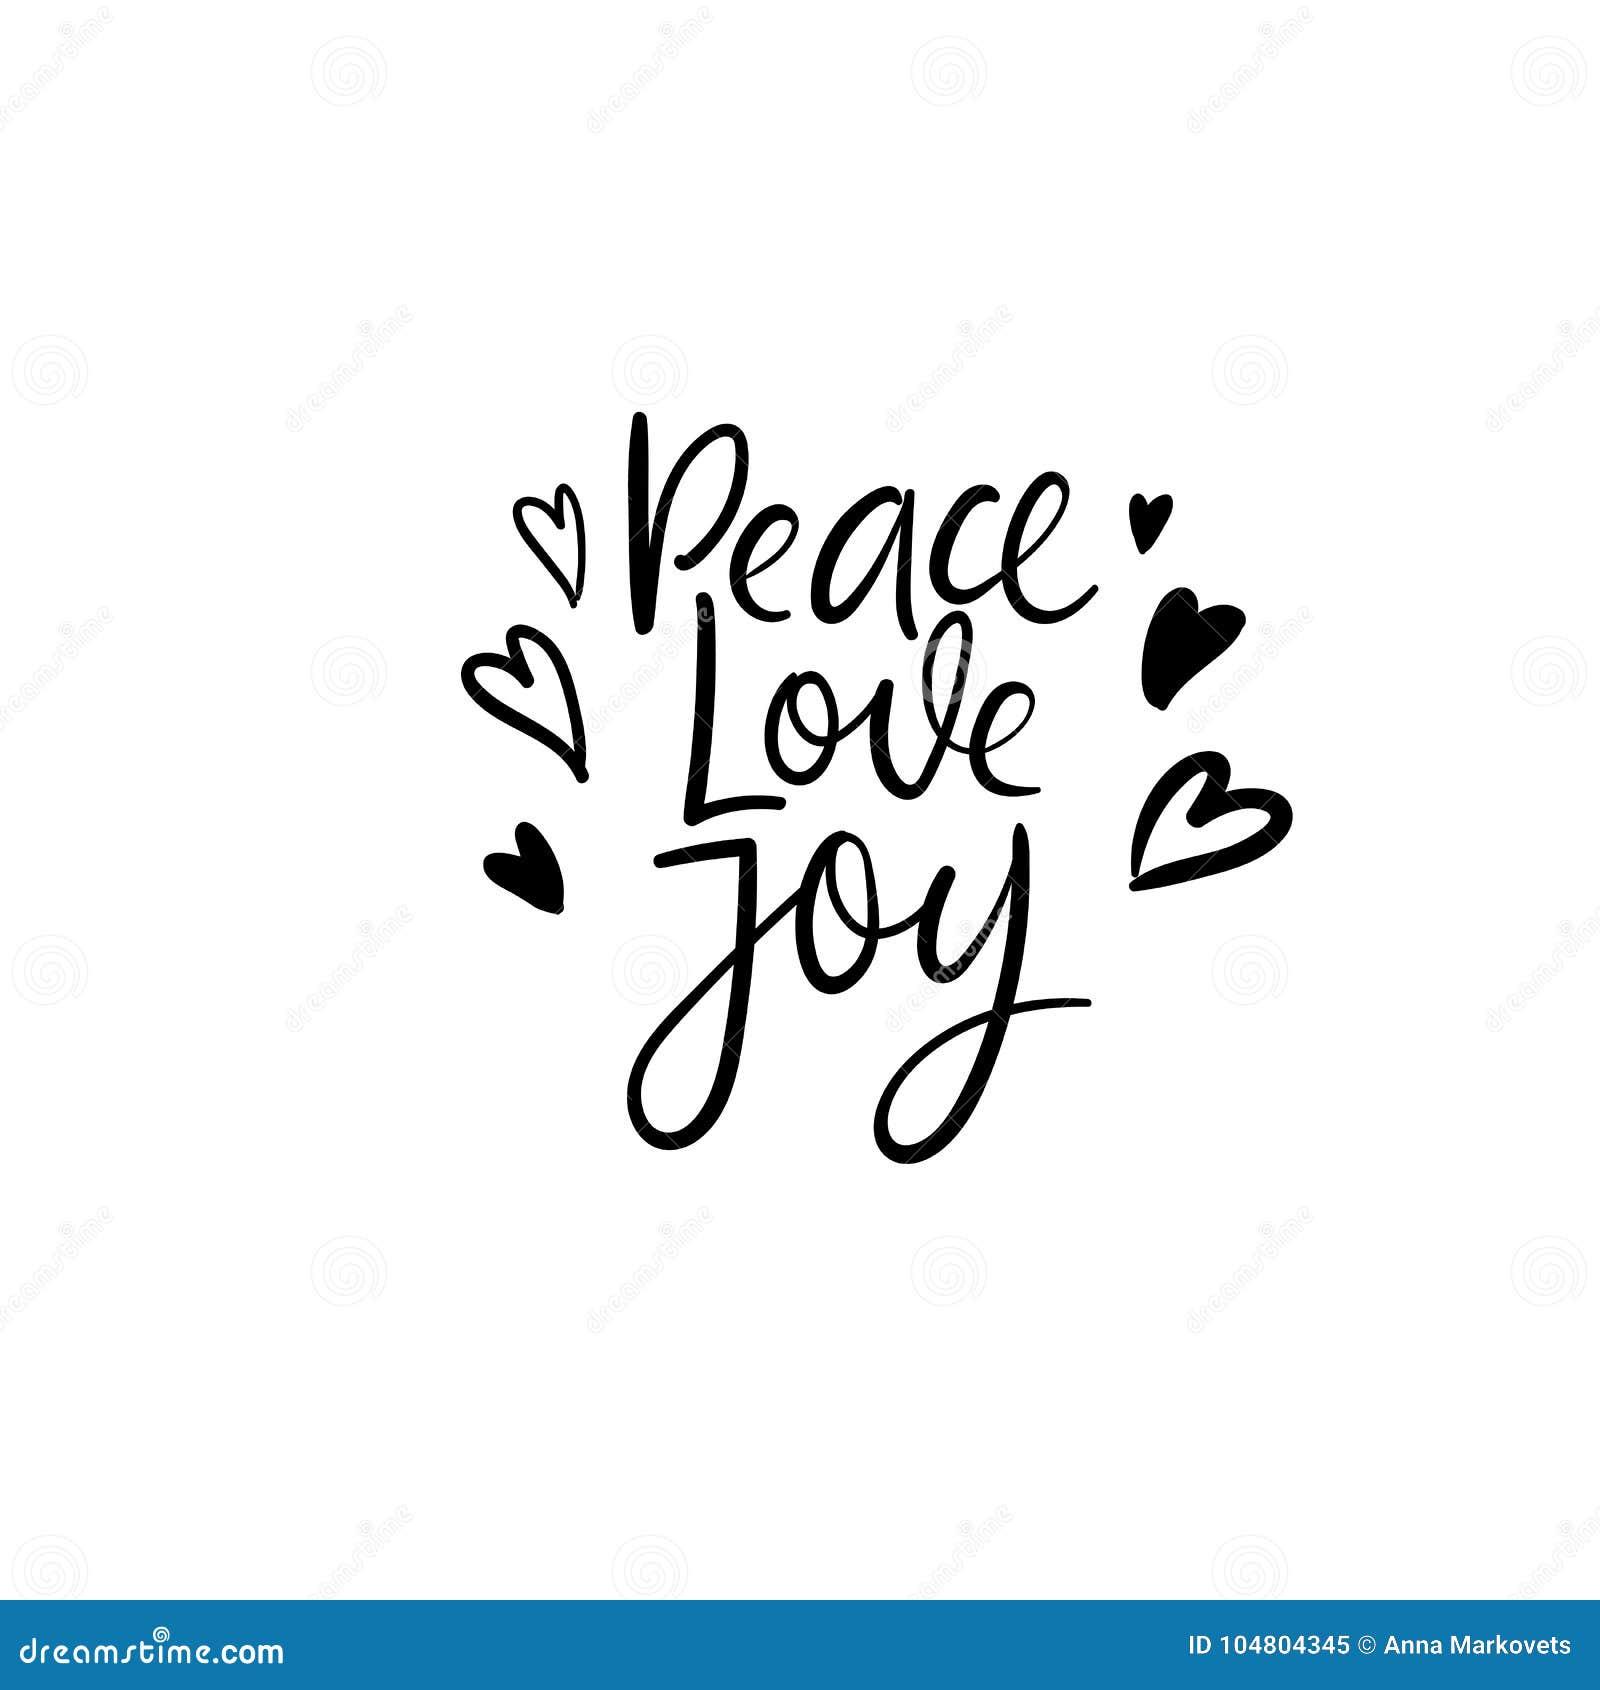 Peace love joy christmas and happy new year cards modern peace love joy christmas and happy new year cards modern calligraphy hand lettering m4hsunfo